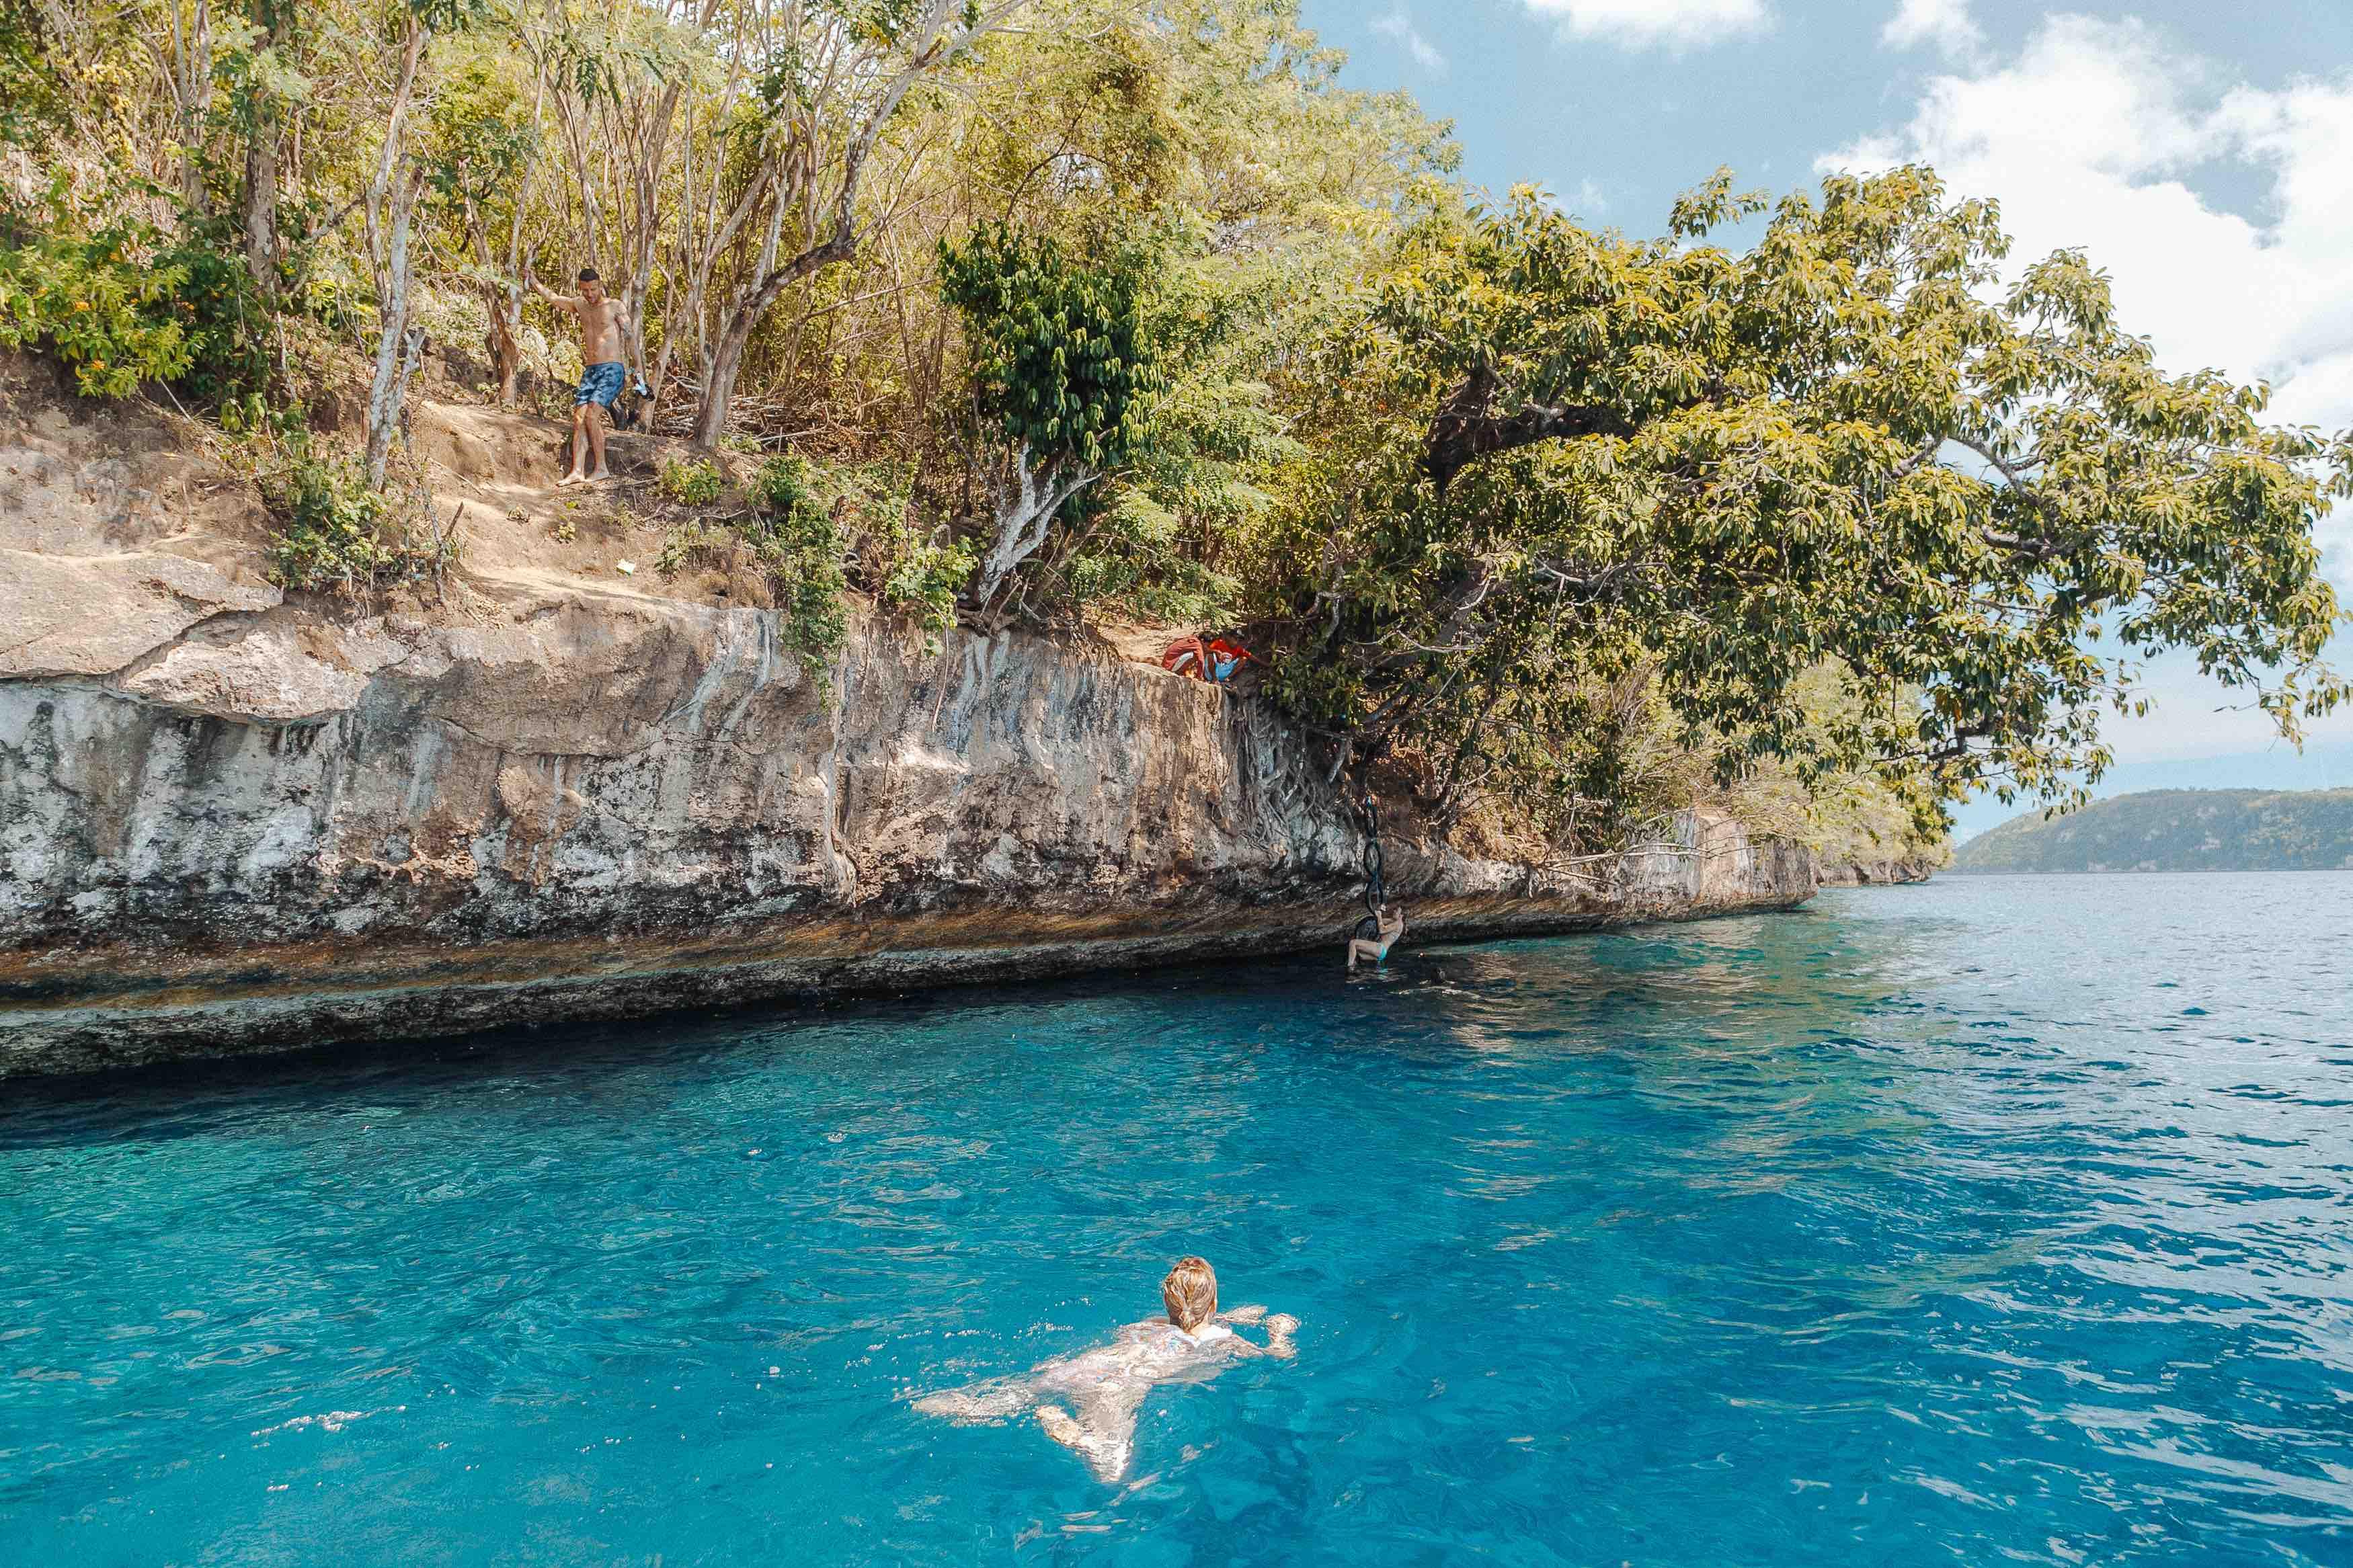 Snorkeling Cliff Jump Nusa Penida Adventure